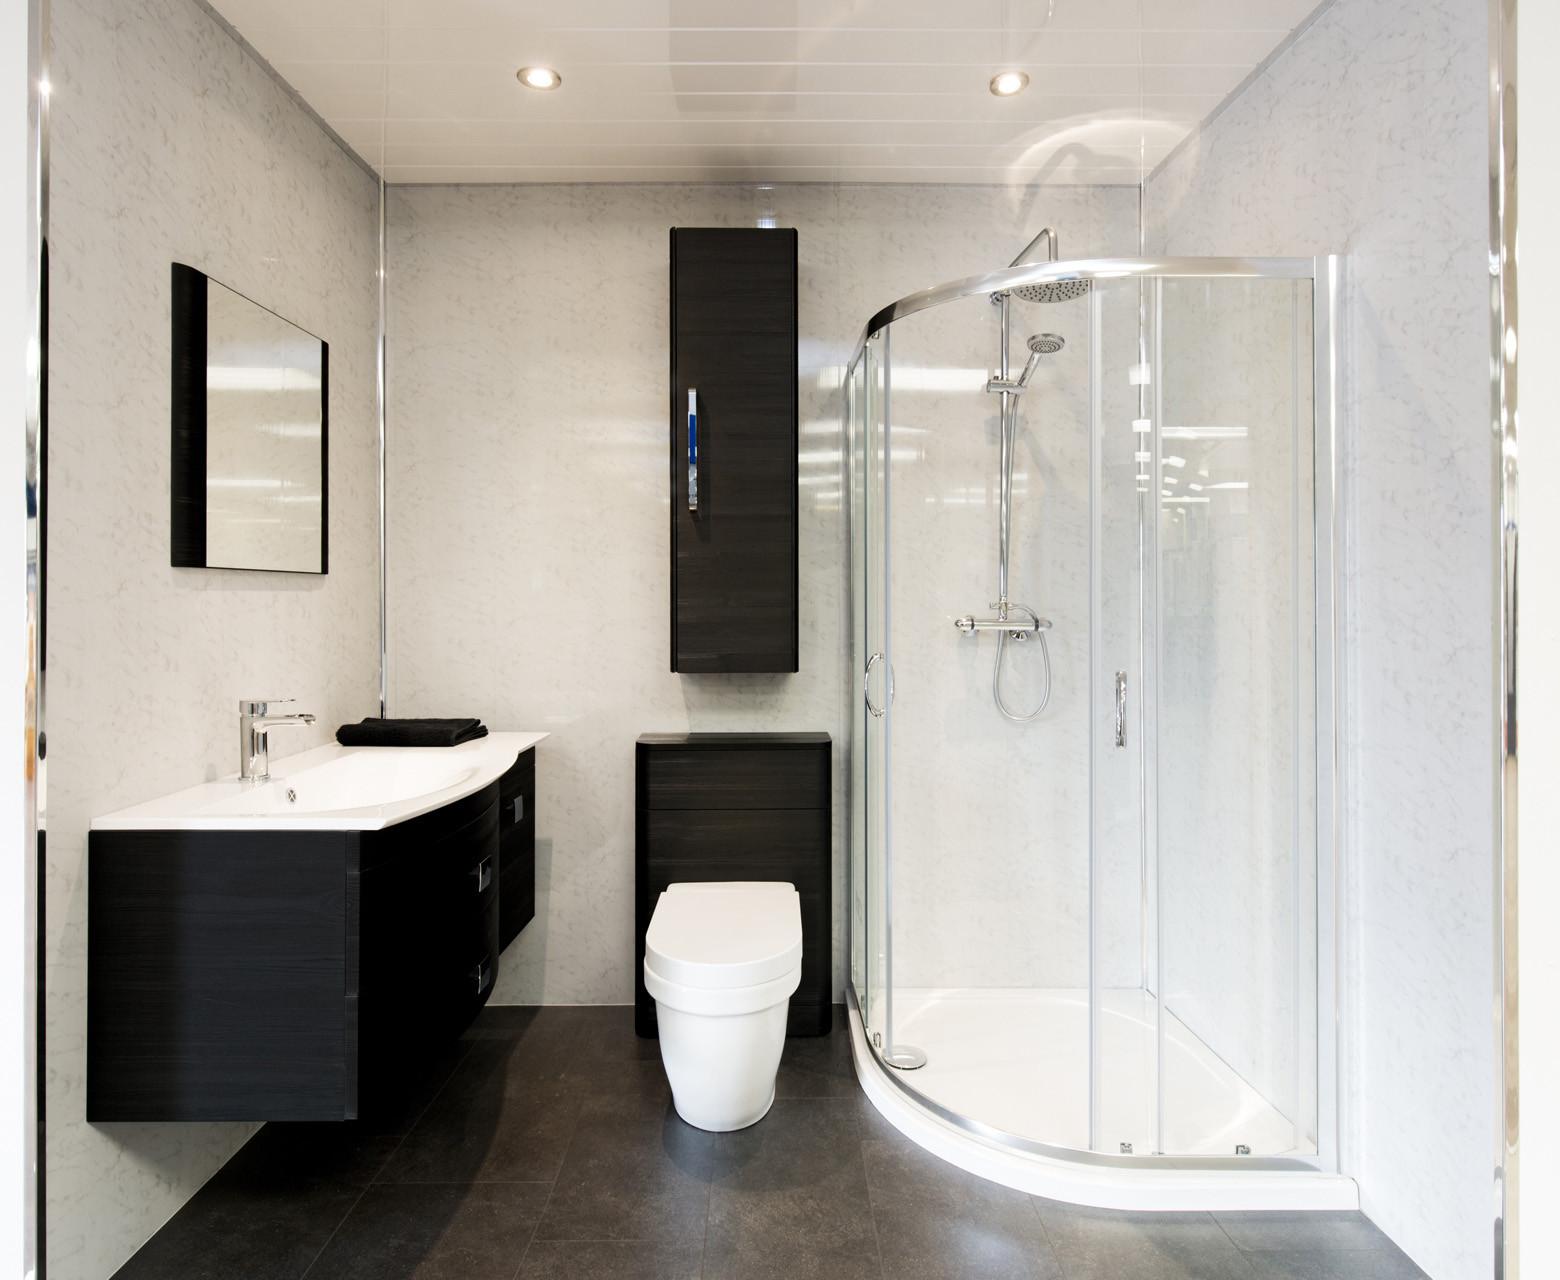 Bathroom wall panels PVC bathroom wall panels MQKTFPW